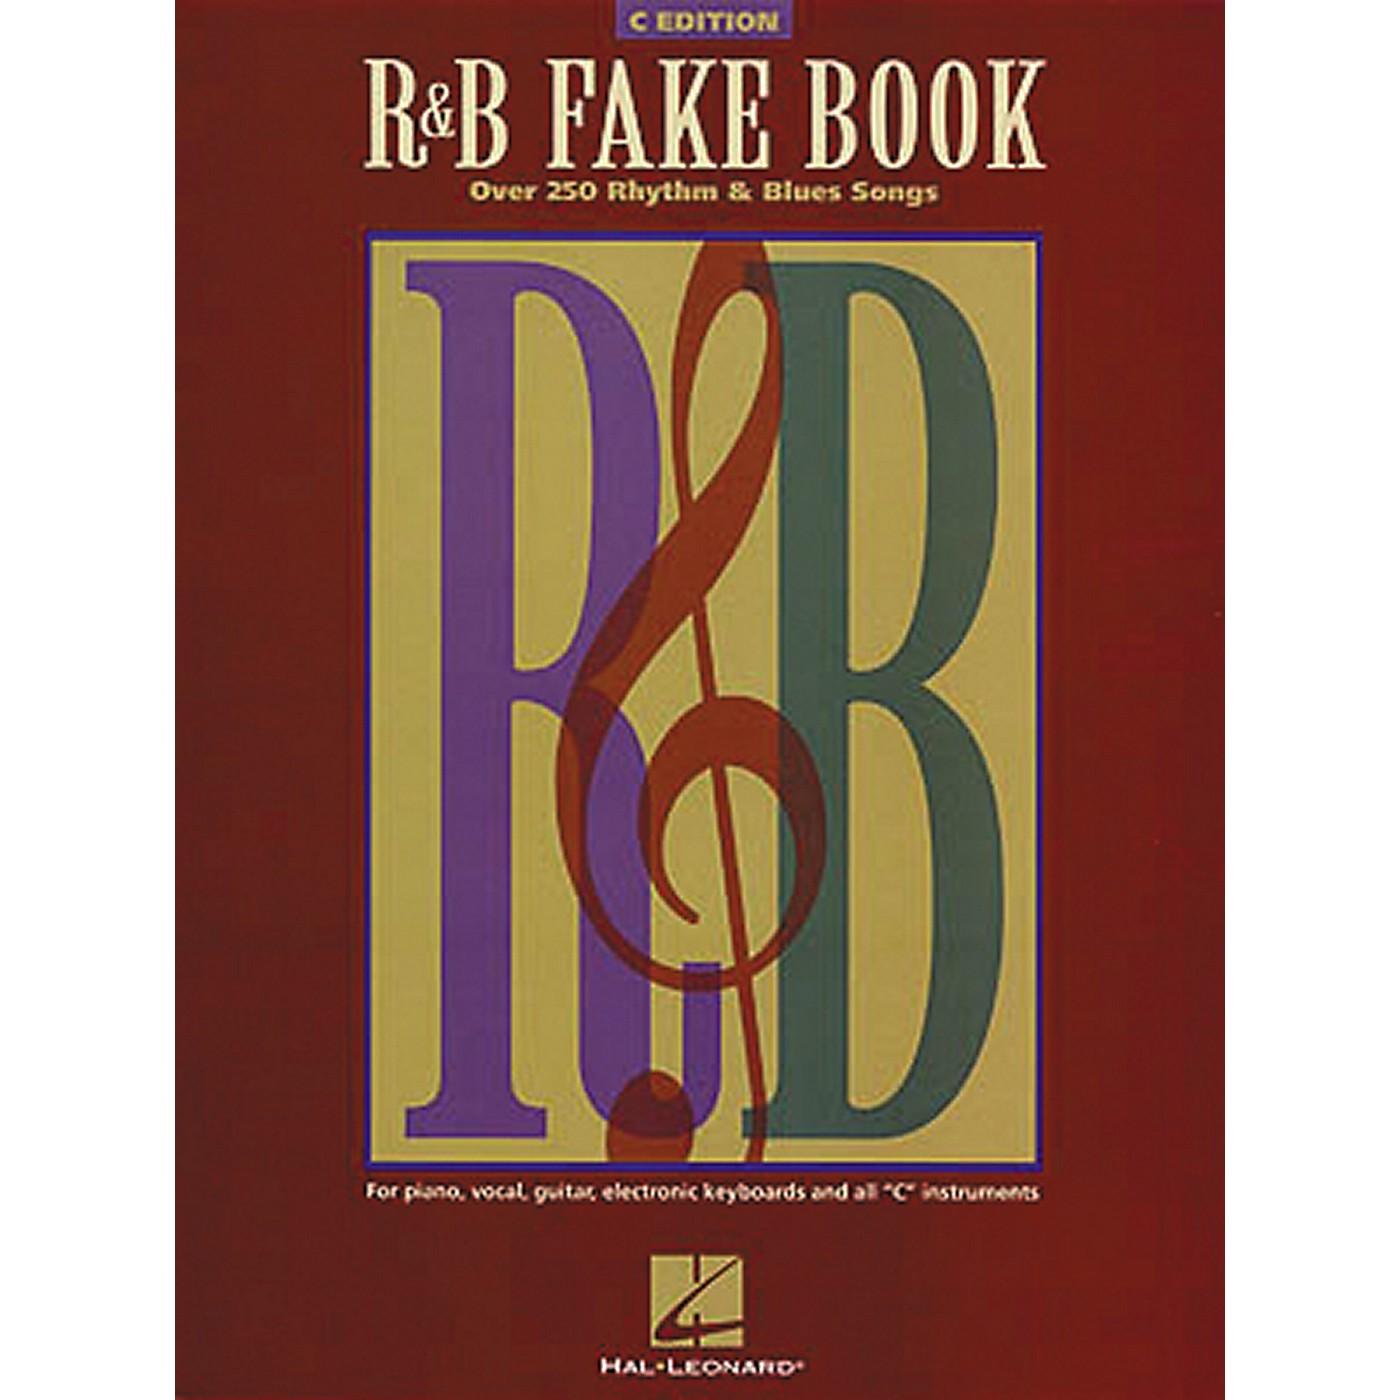 Hal Leonard The R&B Fake Book - C Edition thumbnail